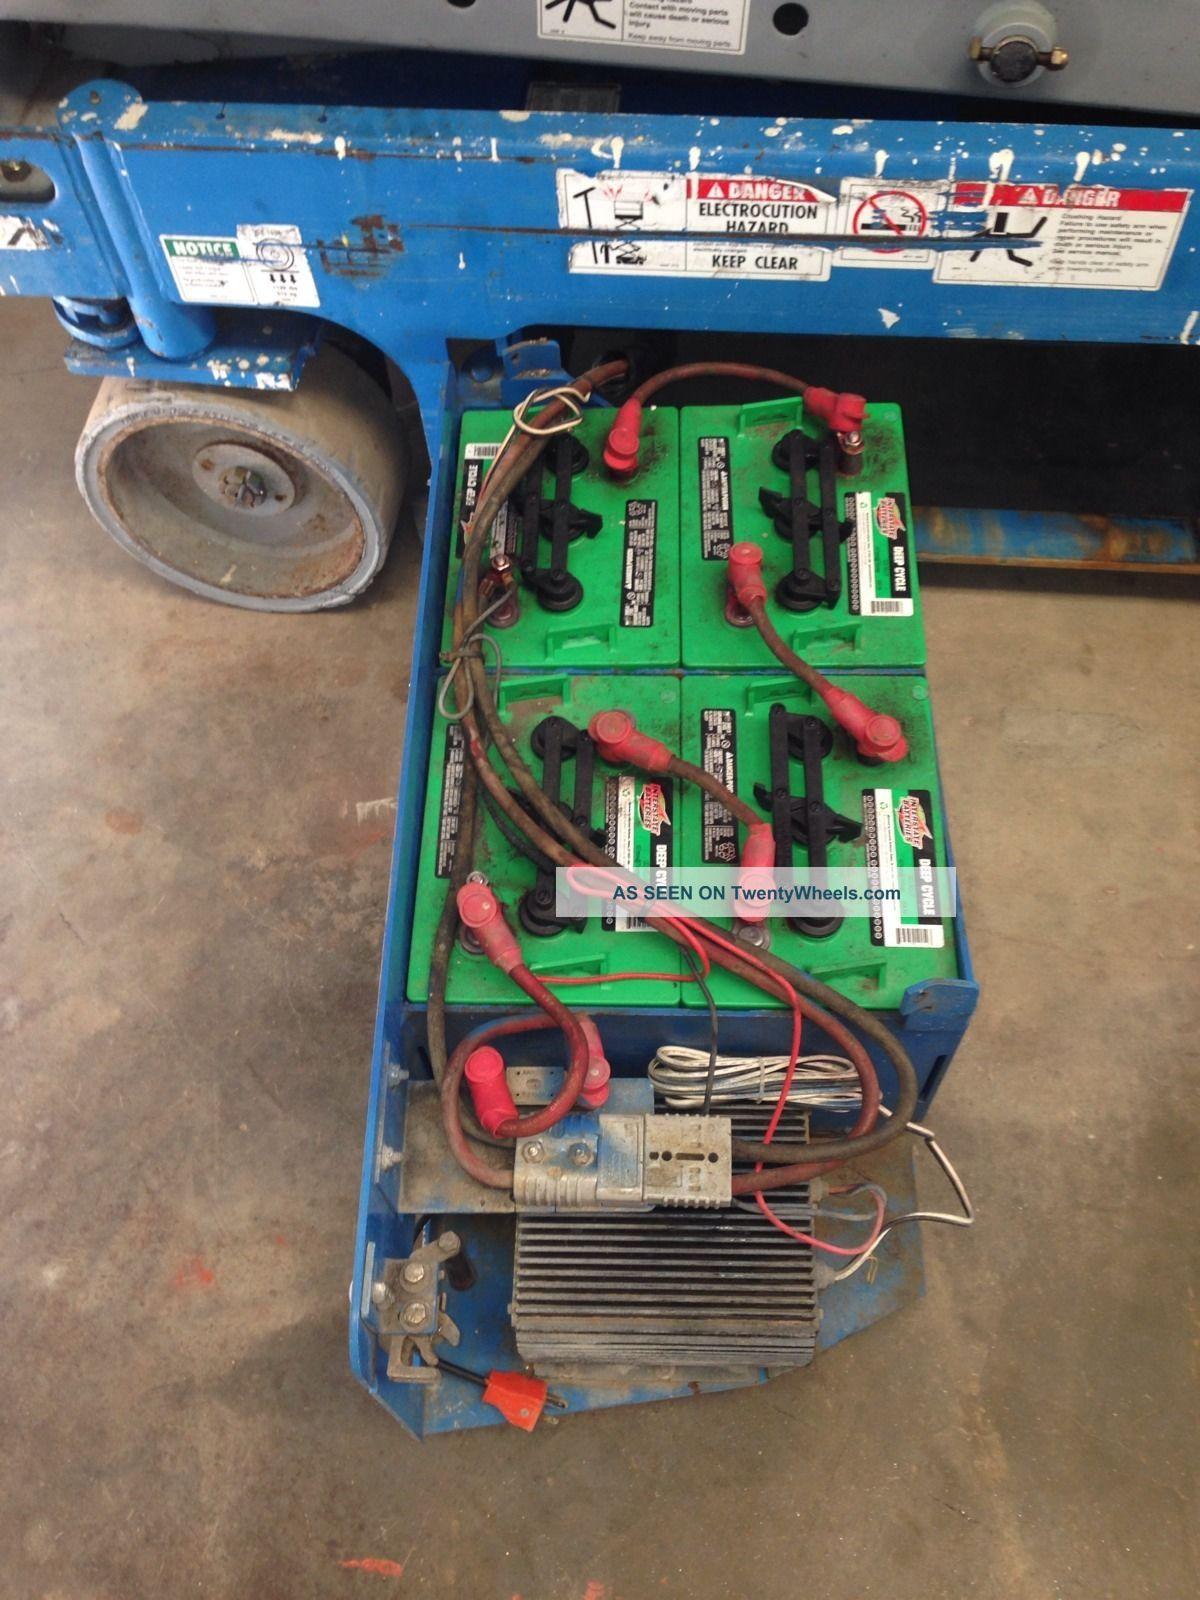 EA_4420] Scissor Lift Battery Wiring Free DiagramIxtu Sapebe Sheox Coun Mecad Mopar Synk Kicep Usnes Icaen Cosm Bepta Isra  Mohammedshrine Librar Wiring 101